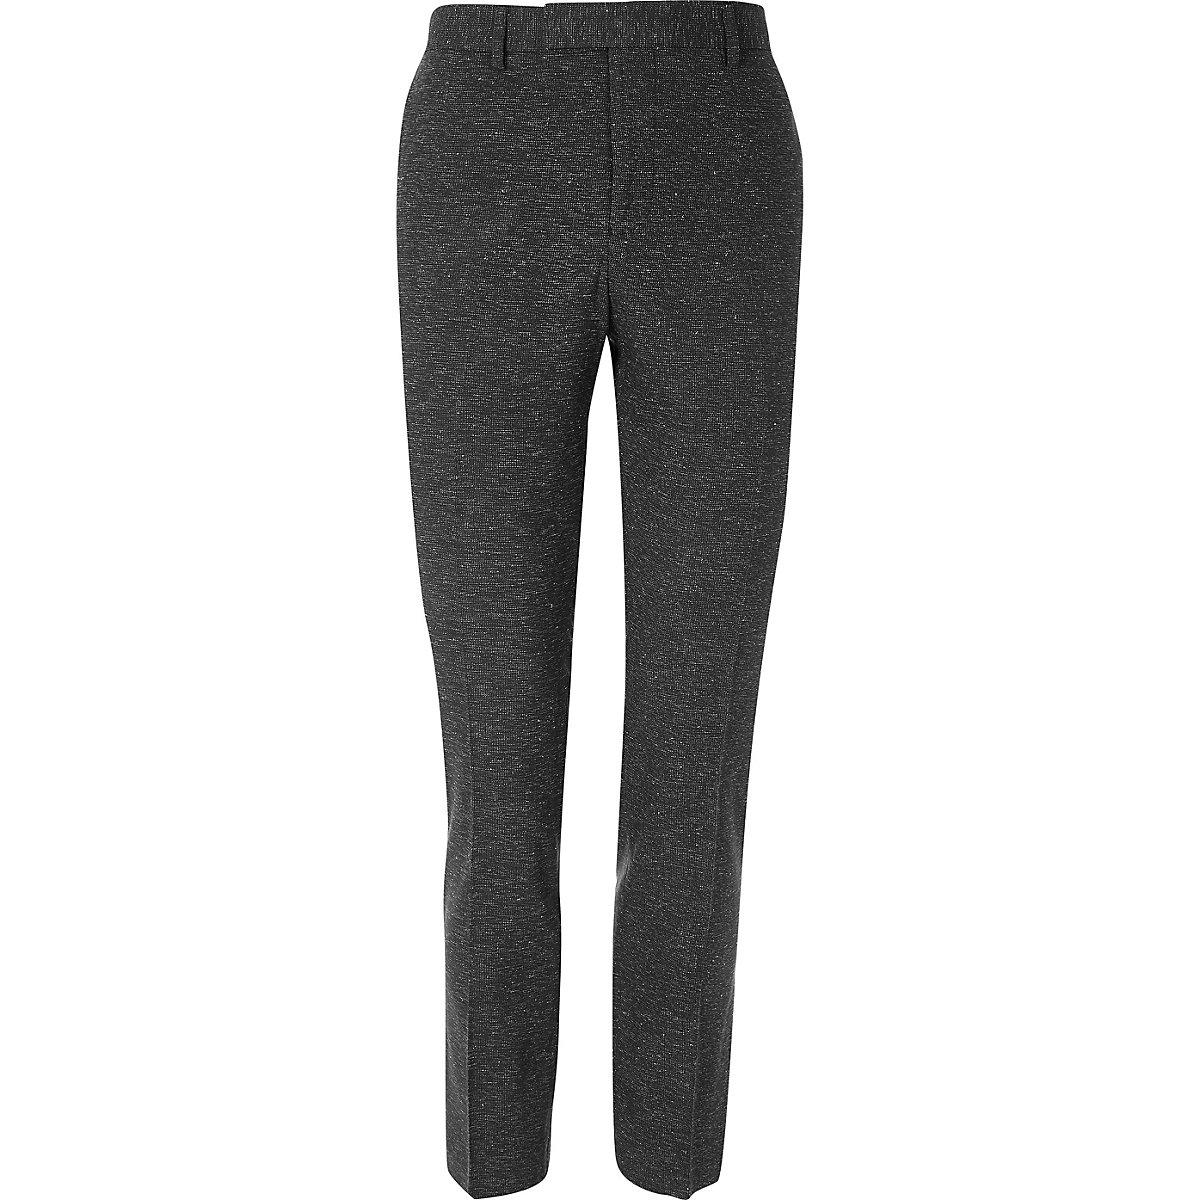 Black super skinny suit trousers